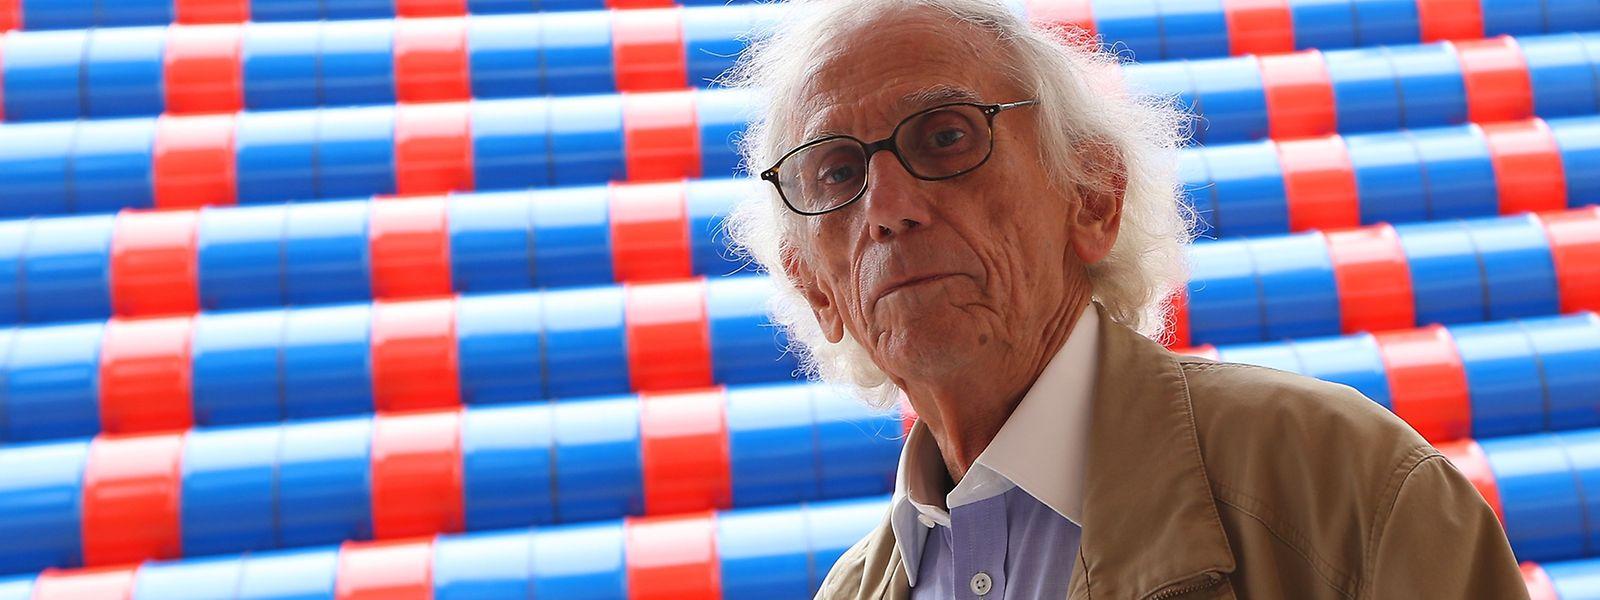 Avec son Mastaba, Christo ressuscite un projet né en 1967-68.